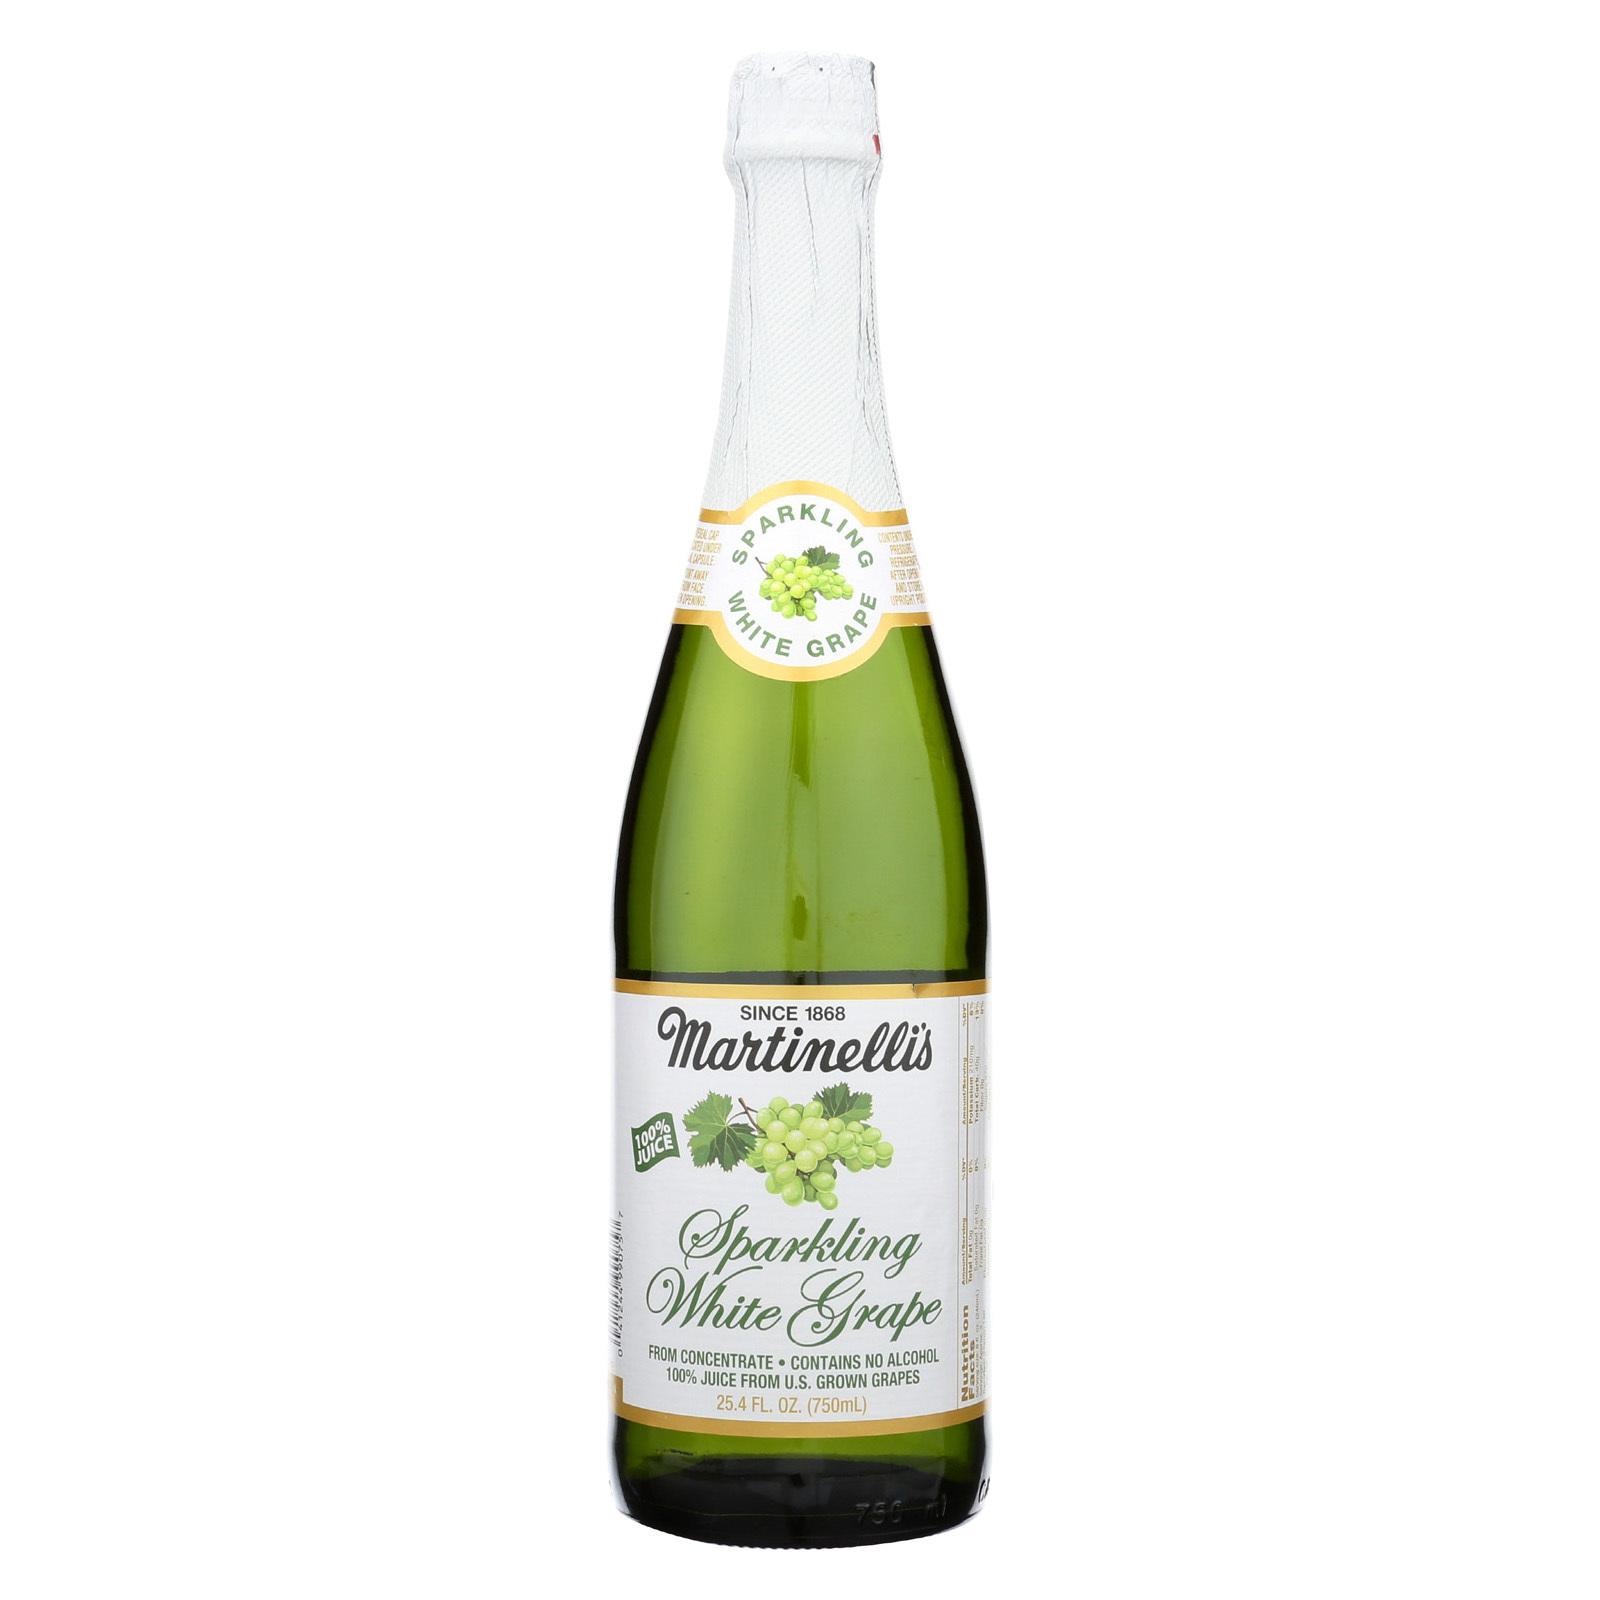 Martinelli's Sparkling Cider - White Grape - Case of 12 - 25.4 fl oz